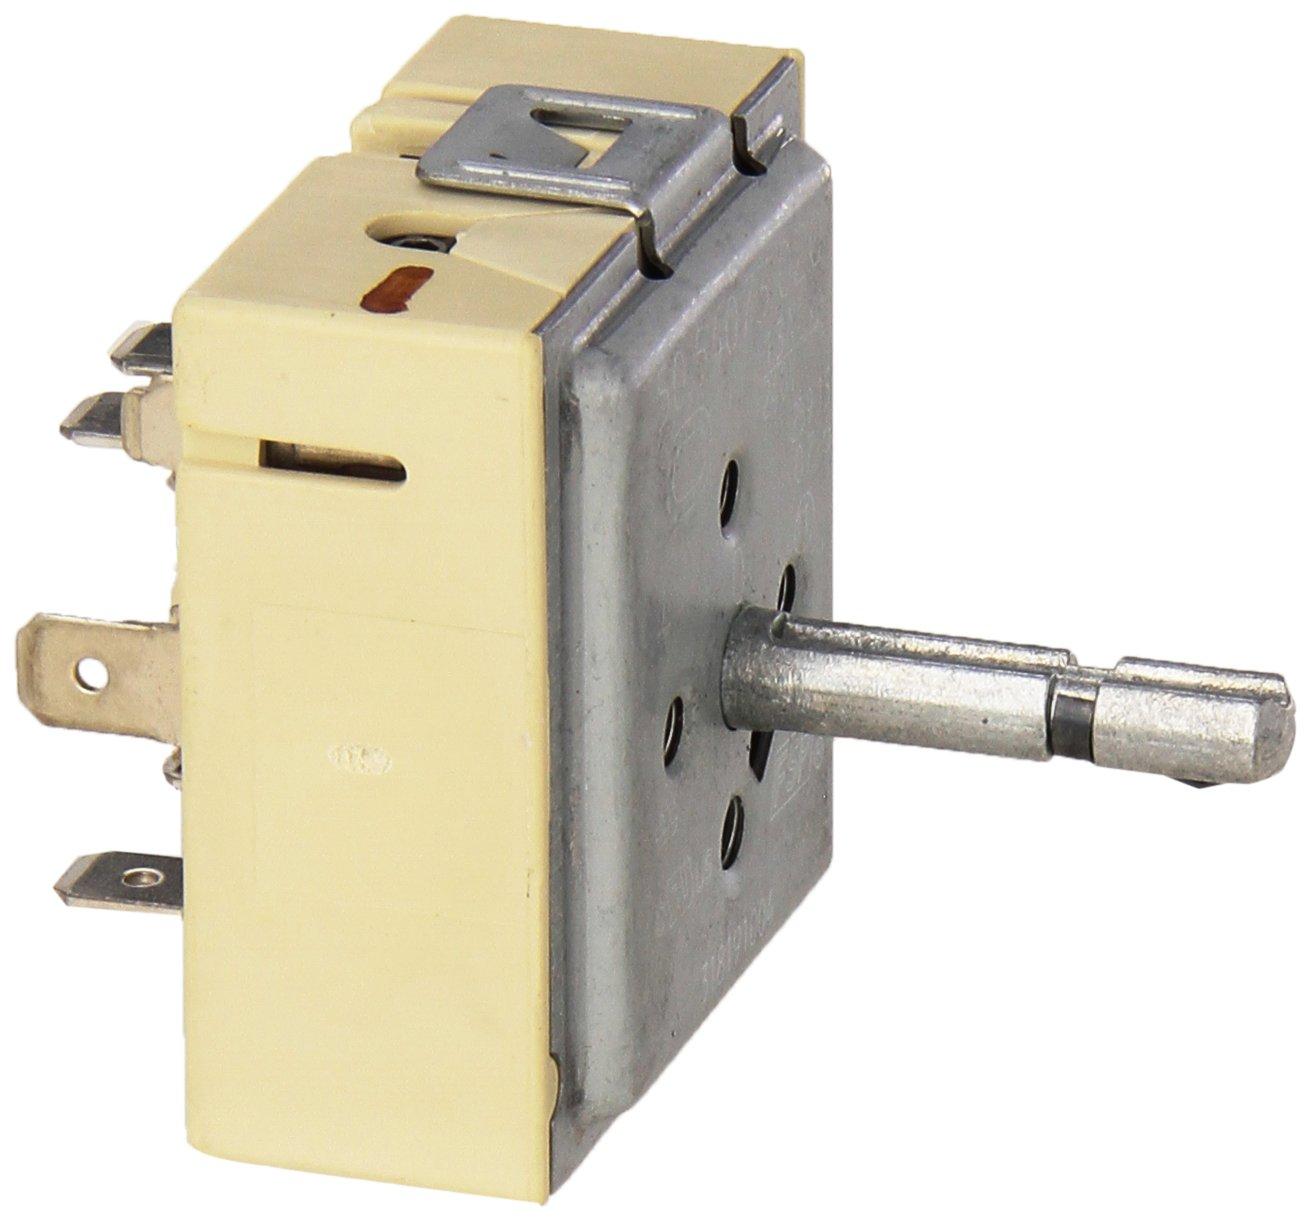 Frigidaire 305458904 Range/Stove/Oven Surface Element Switch